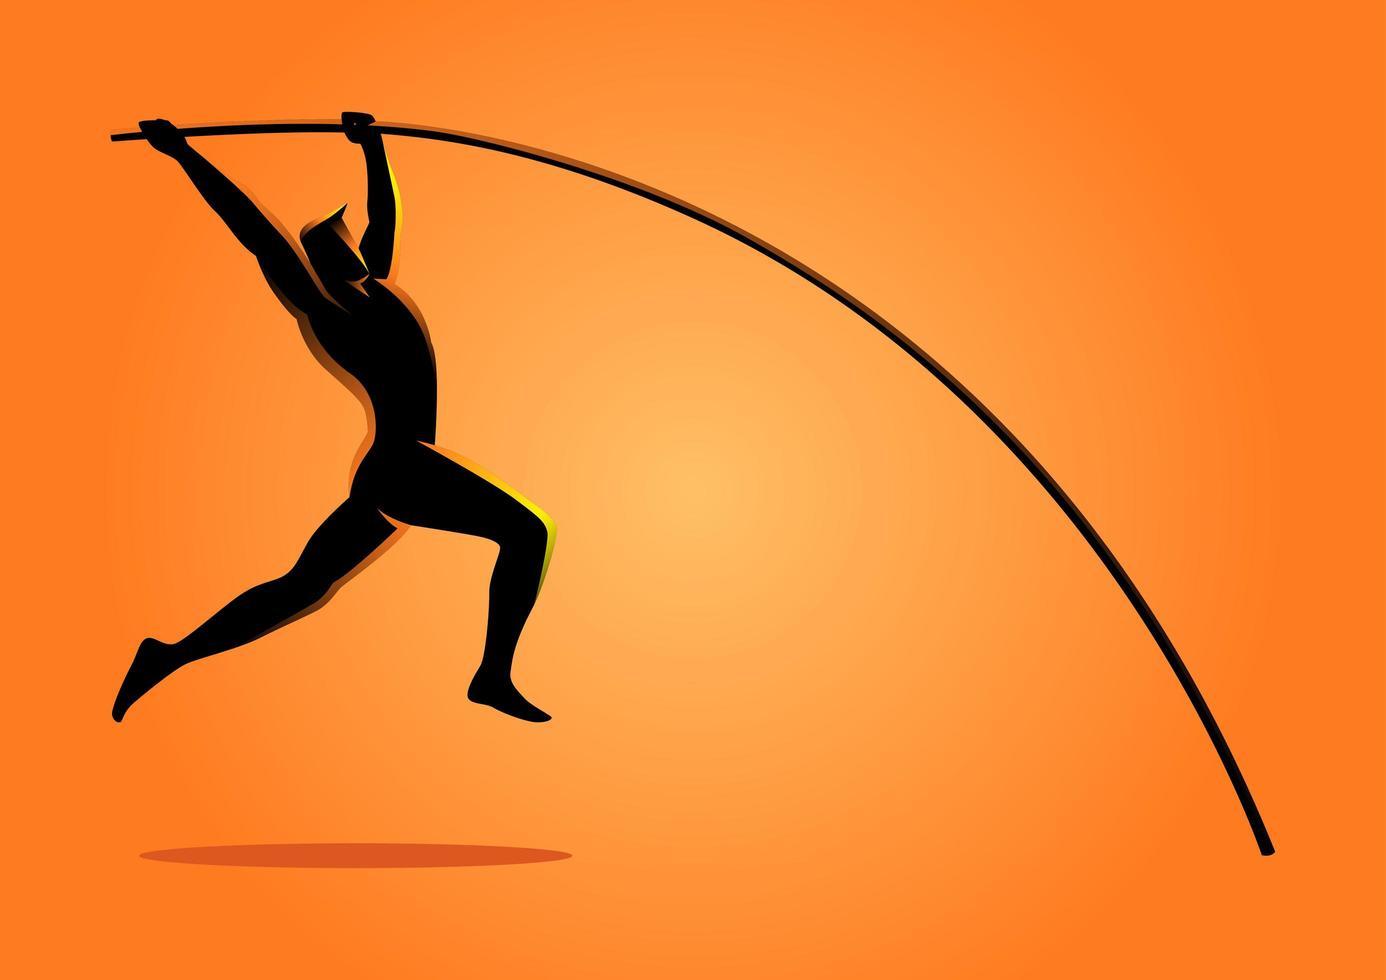 Sport Silhouette Pole Vaulter vector